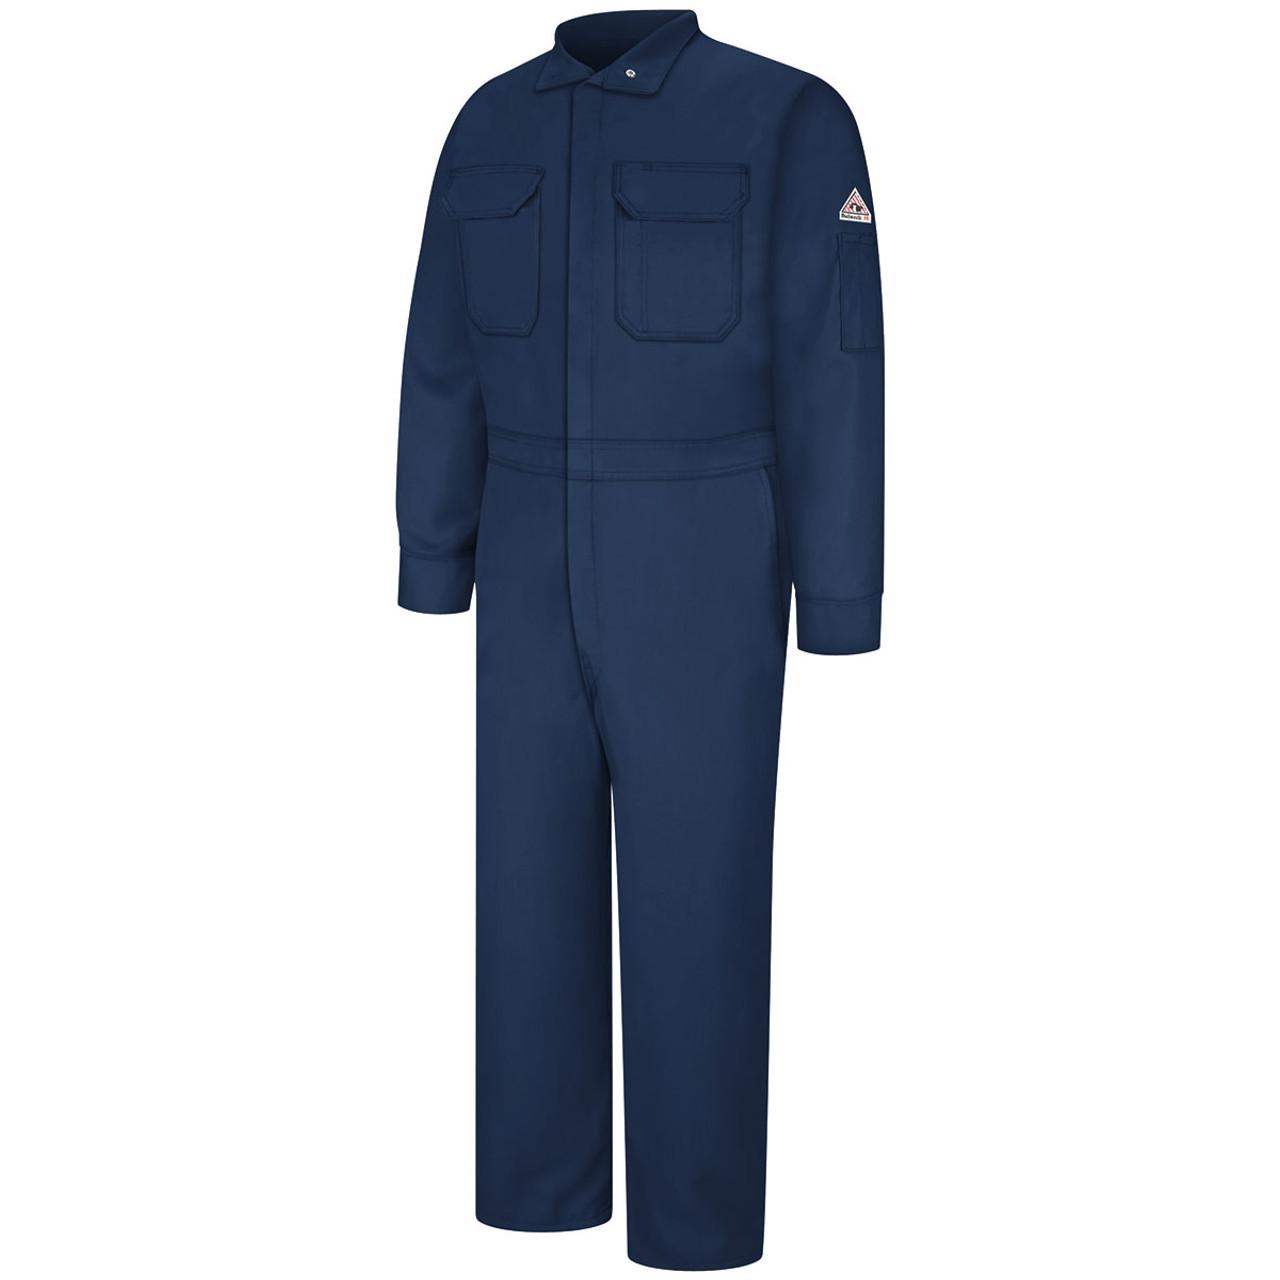 6690a4e4a008 Bulwark FR 6 oz. Nomex IIIA Coveralls CNB6 Navy Blue Front